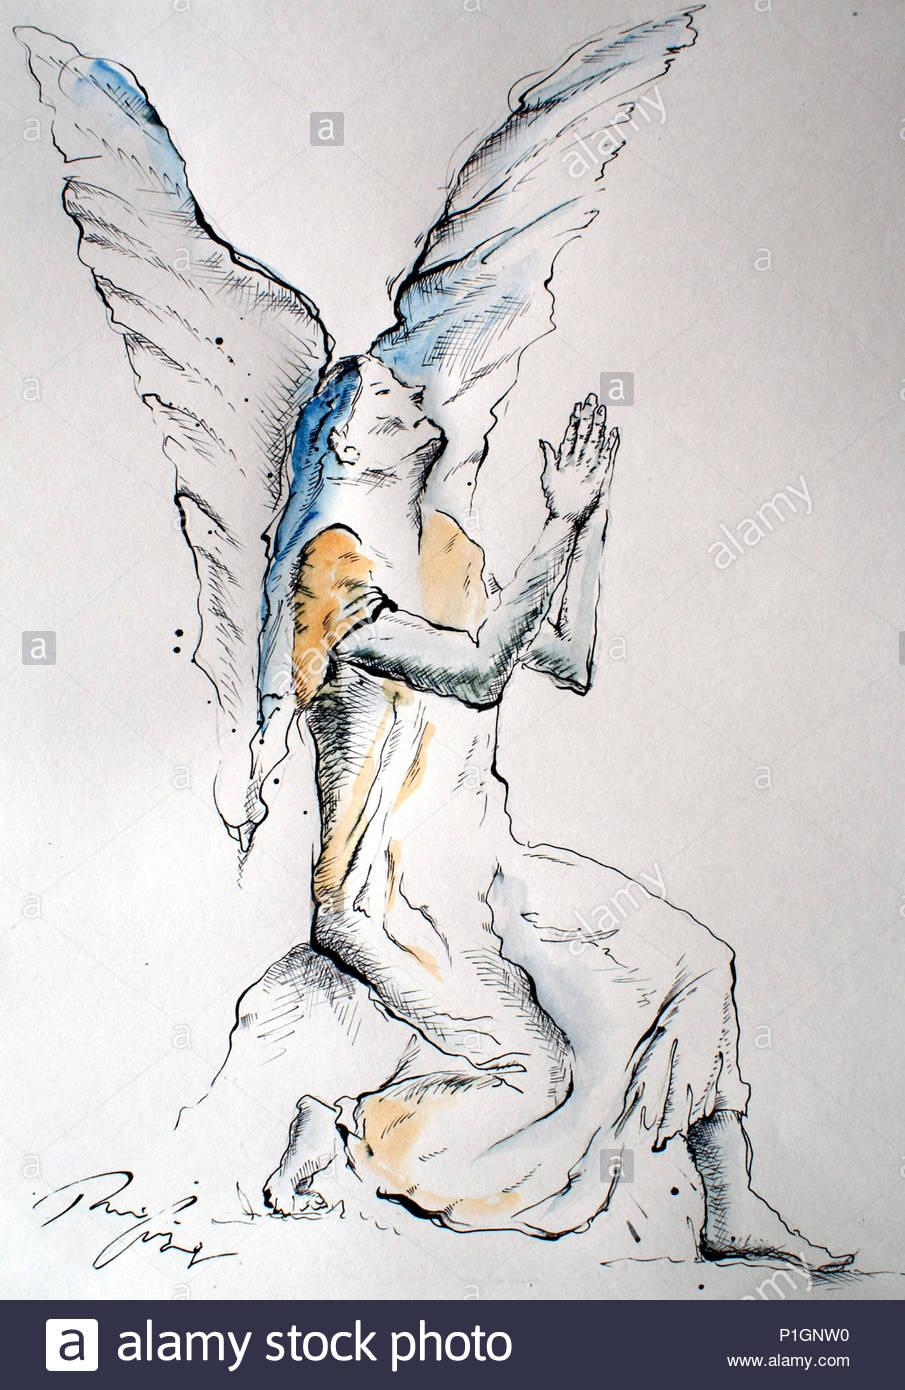 angel at prayer - Stock Image